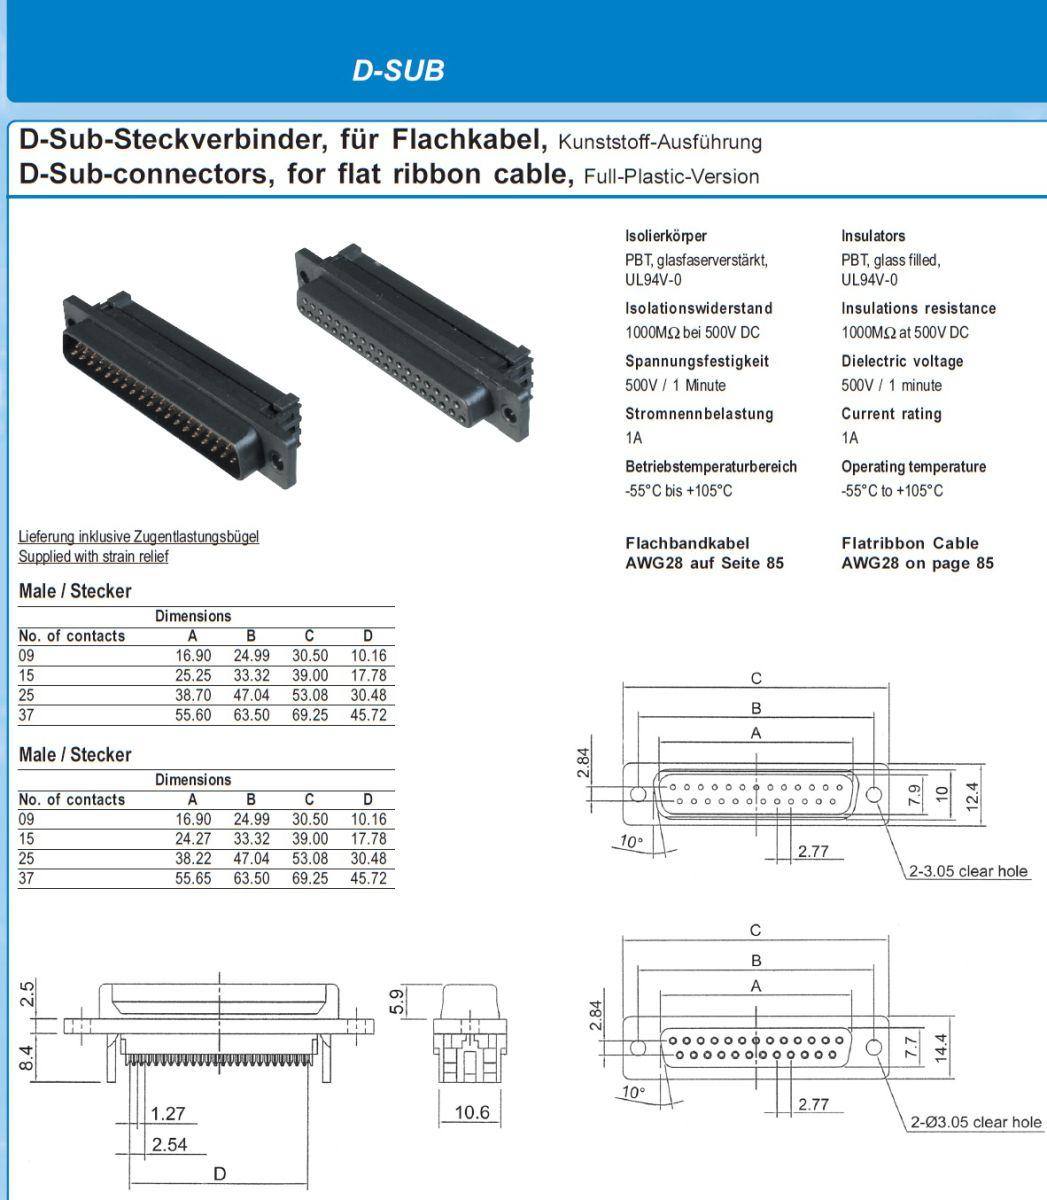 9462 10 poleribbon to 9 pole dsub connector female